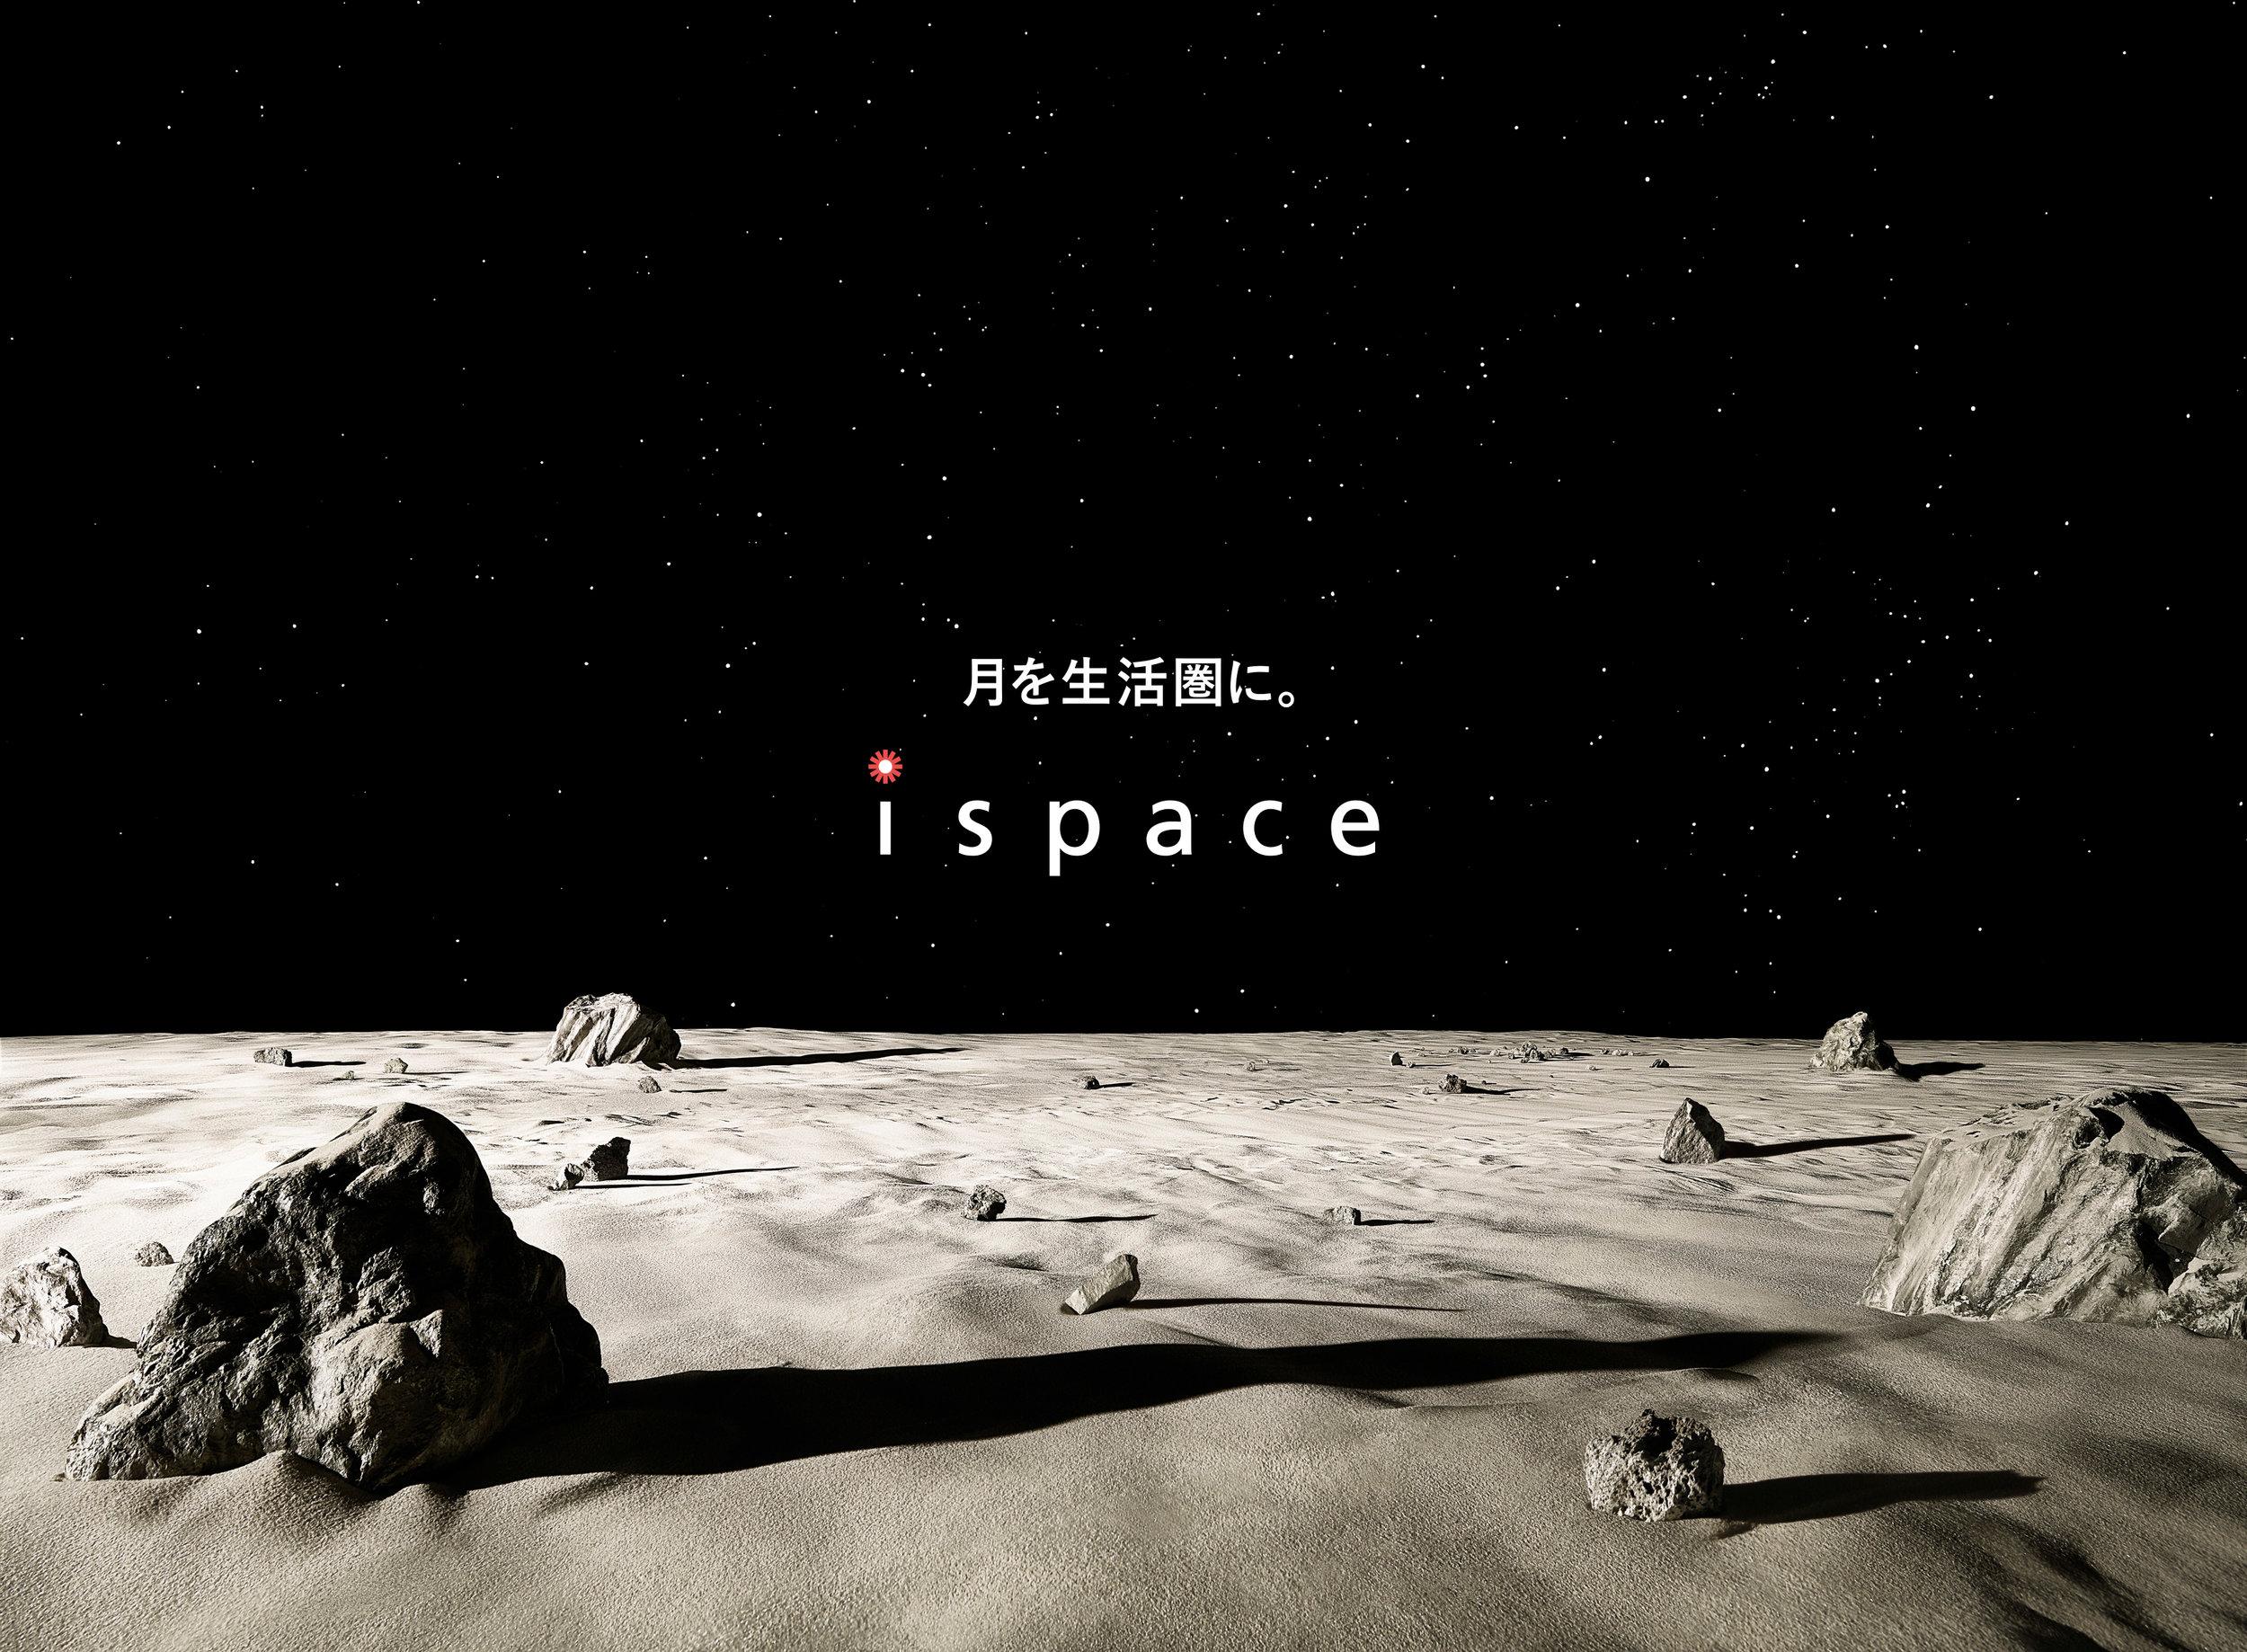 ispace-logo.jpg